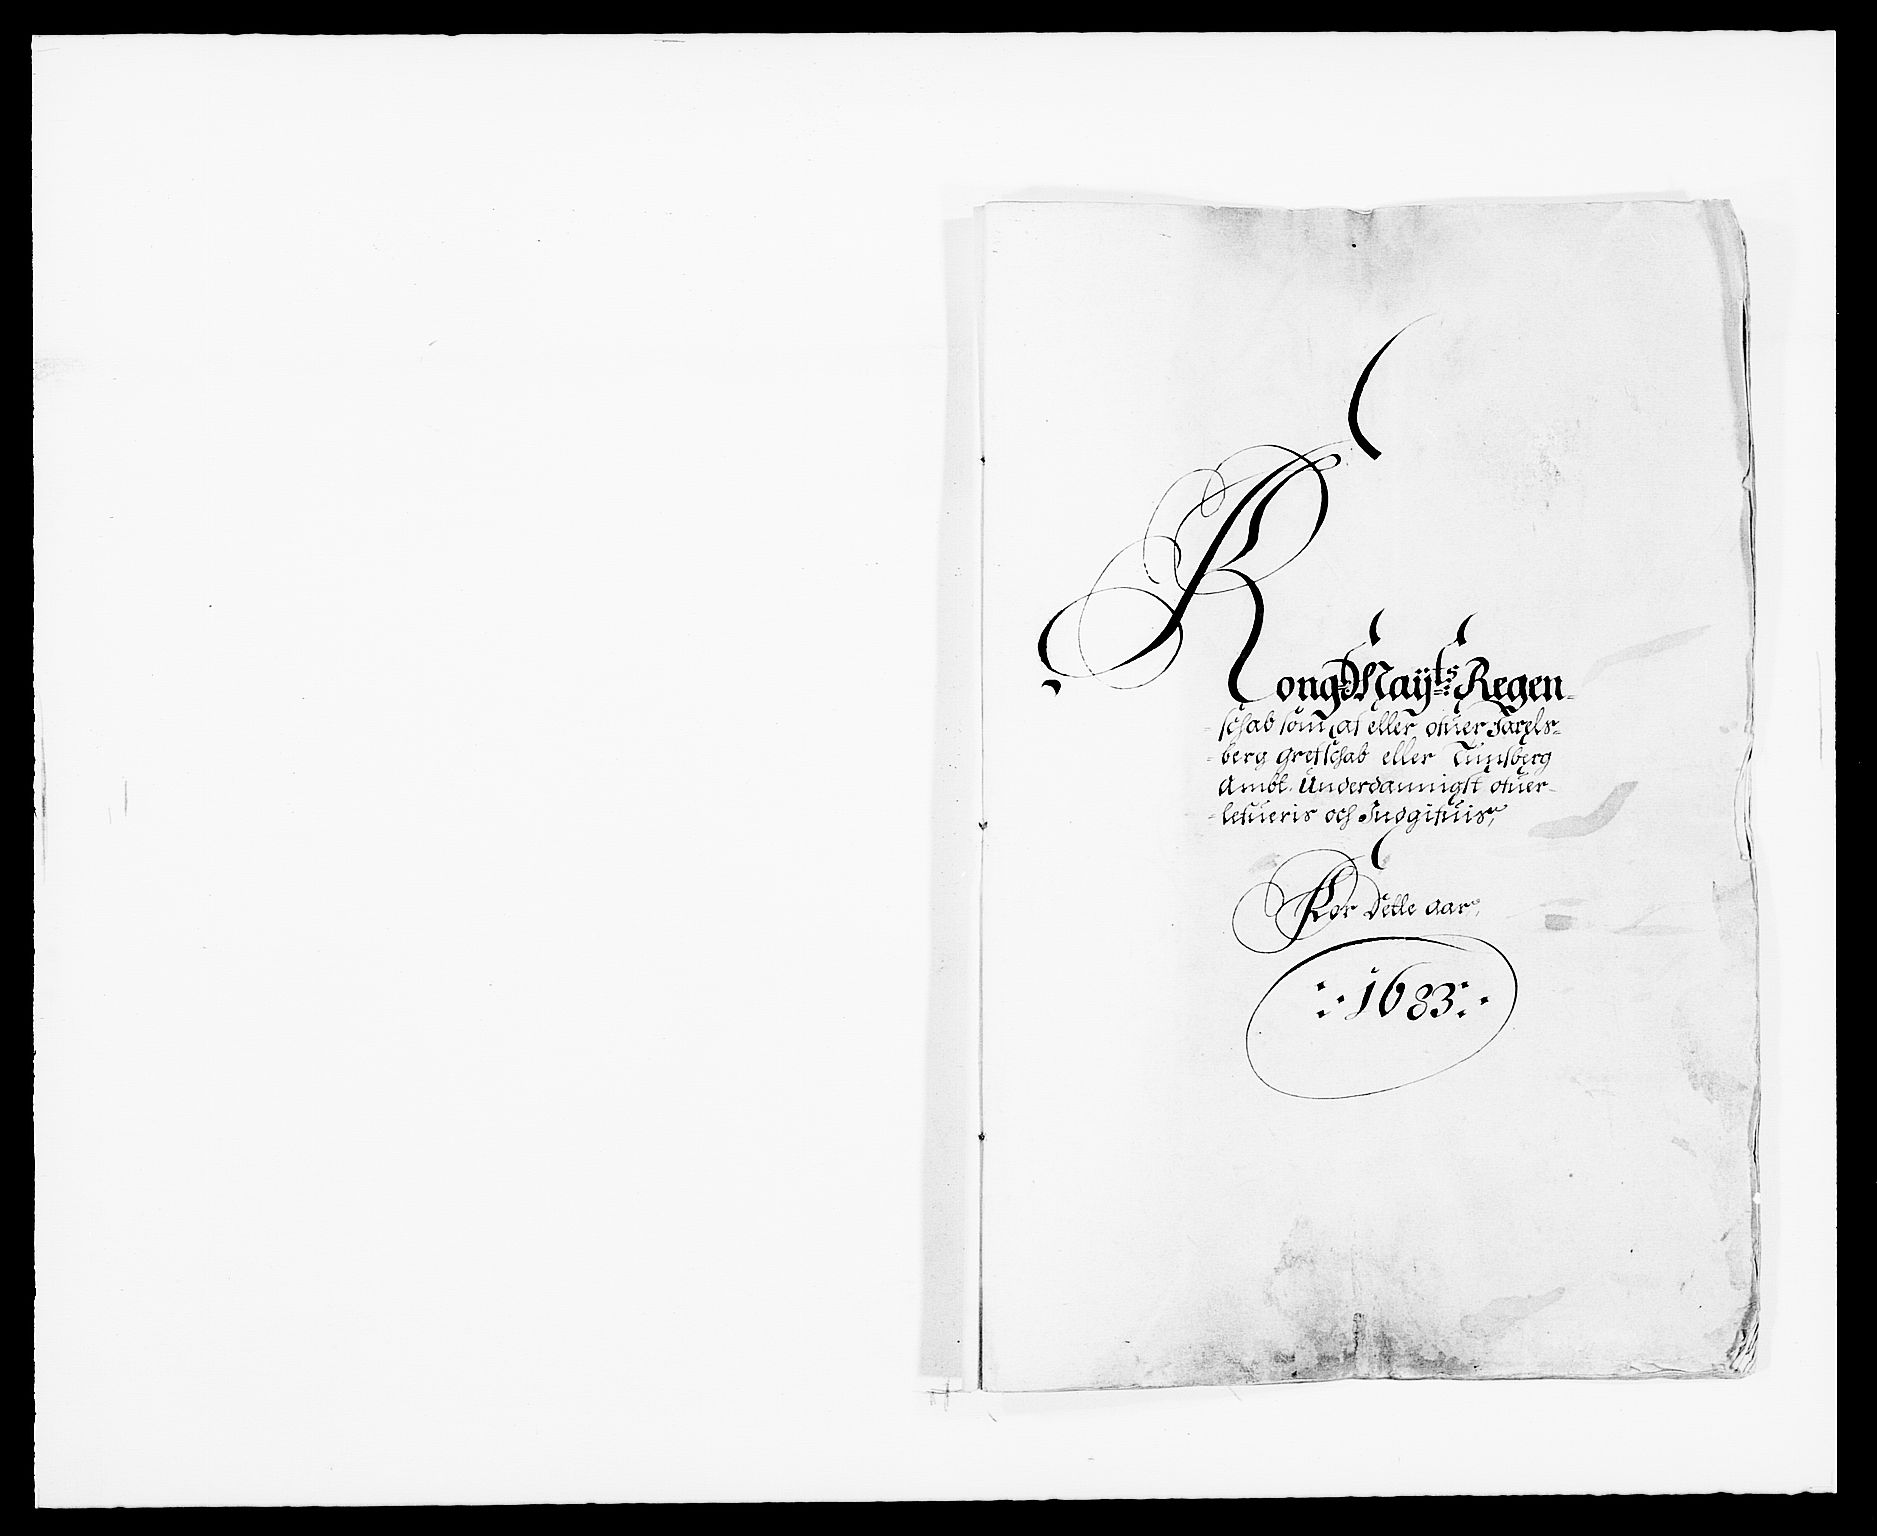 RA, Rentekammeret inntil 1814, Reviderte regnskaper, Fogderegnskap, R32/L1852: Fogderegnskap Jarlsberg grevskap, 1683, s. 1